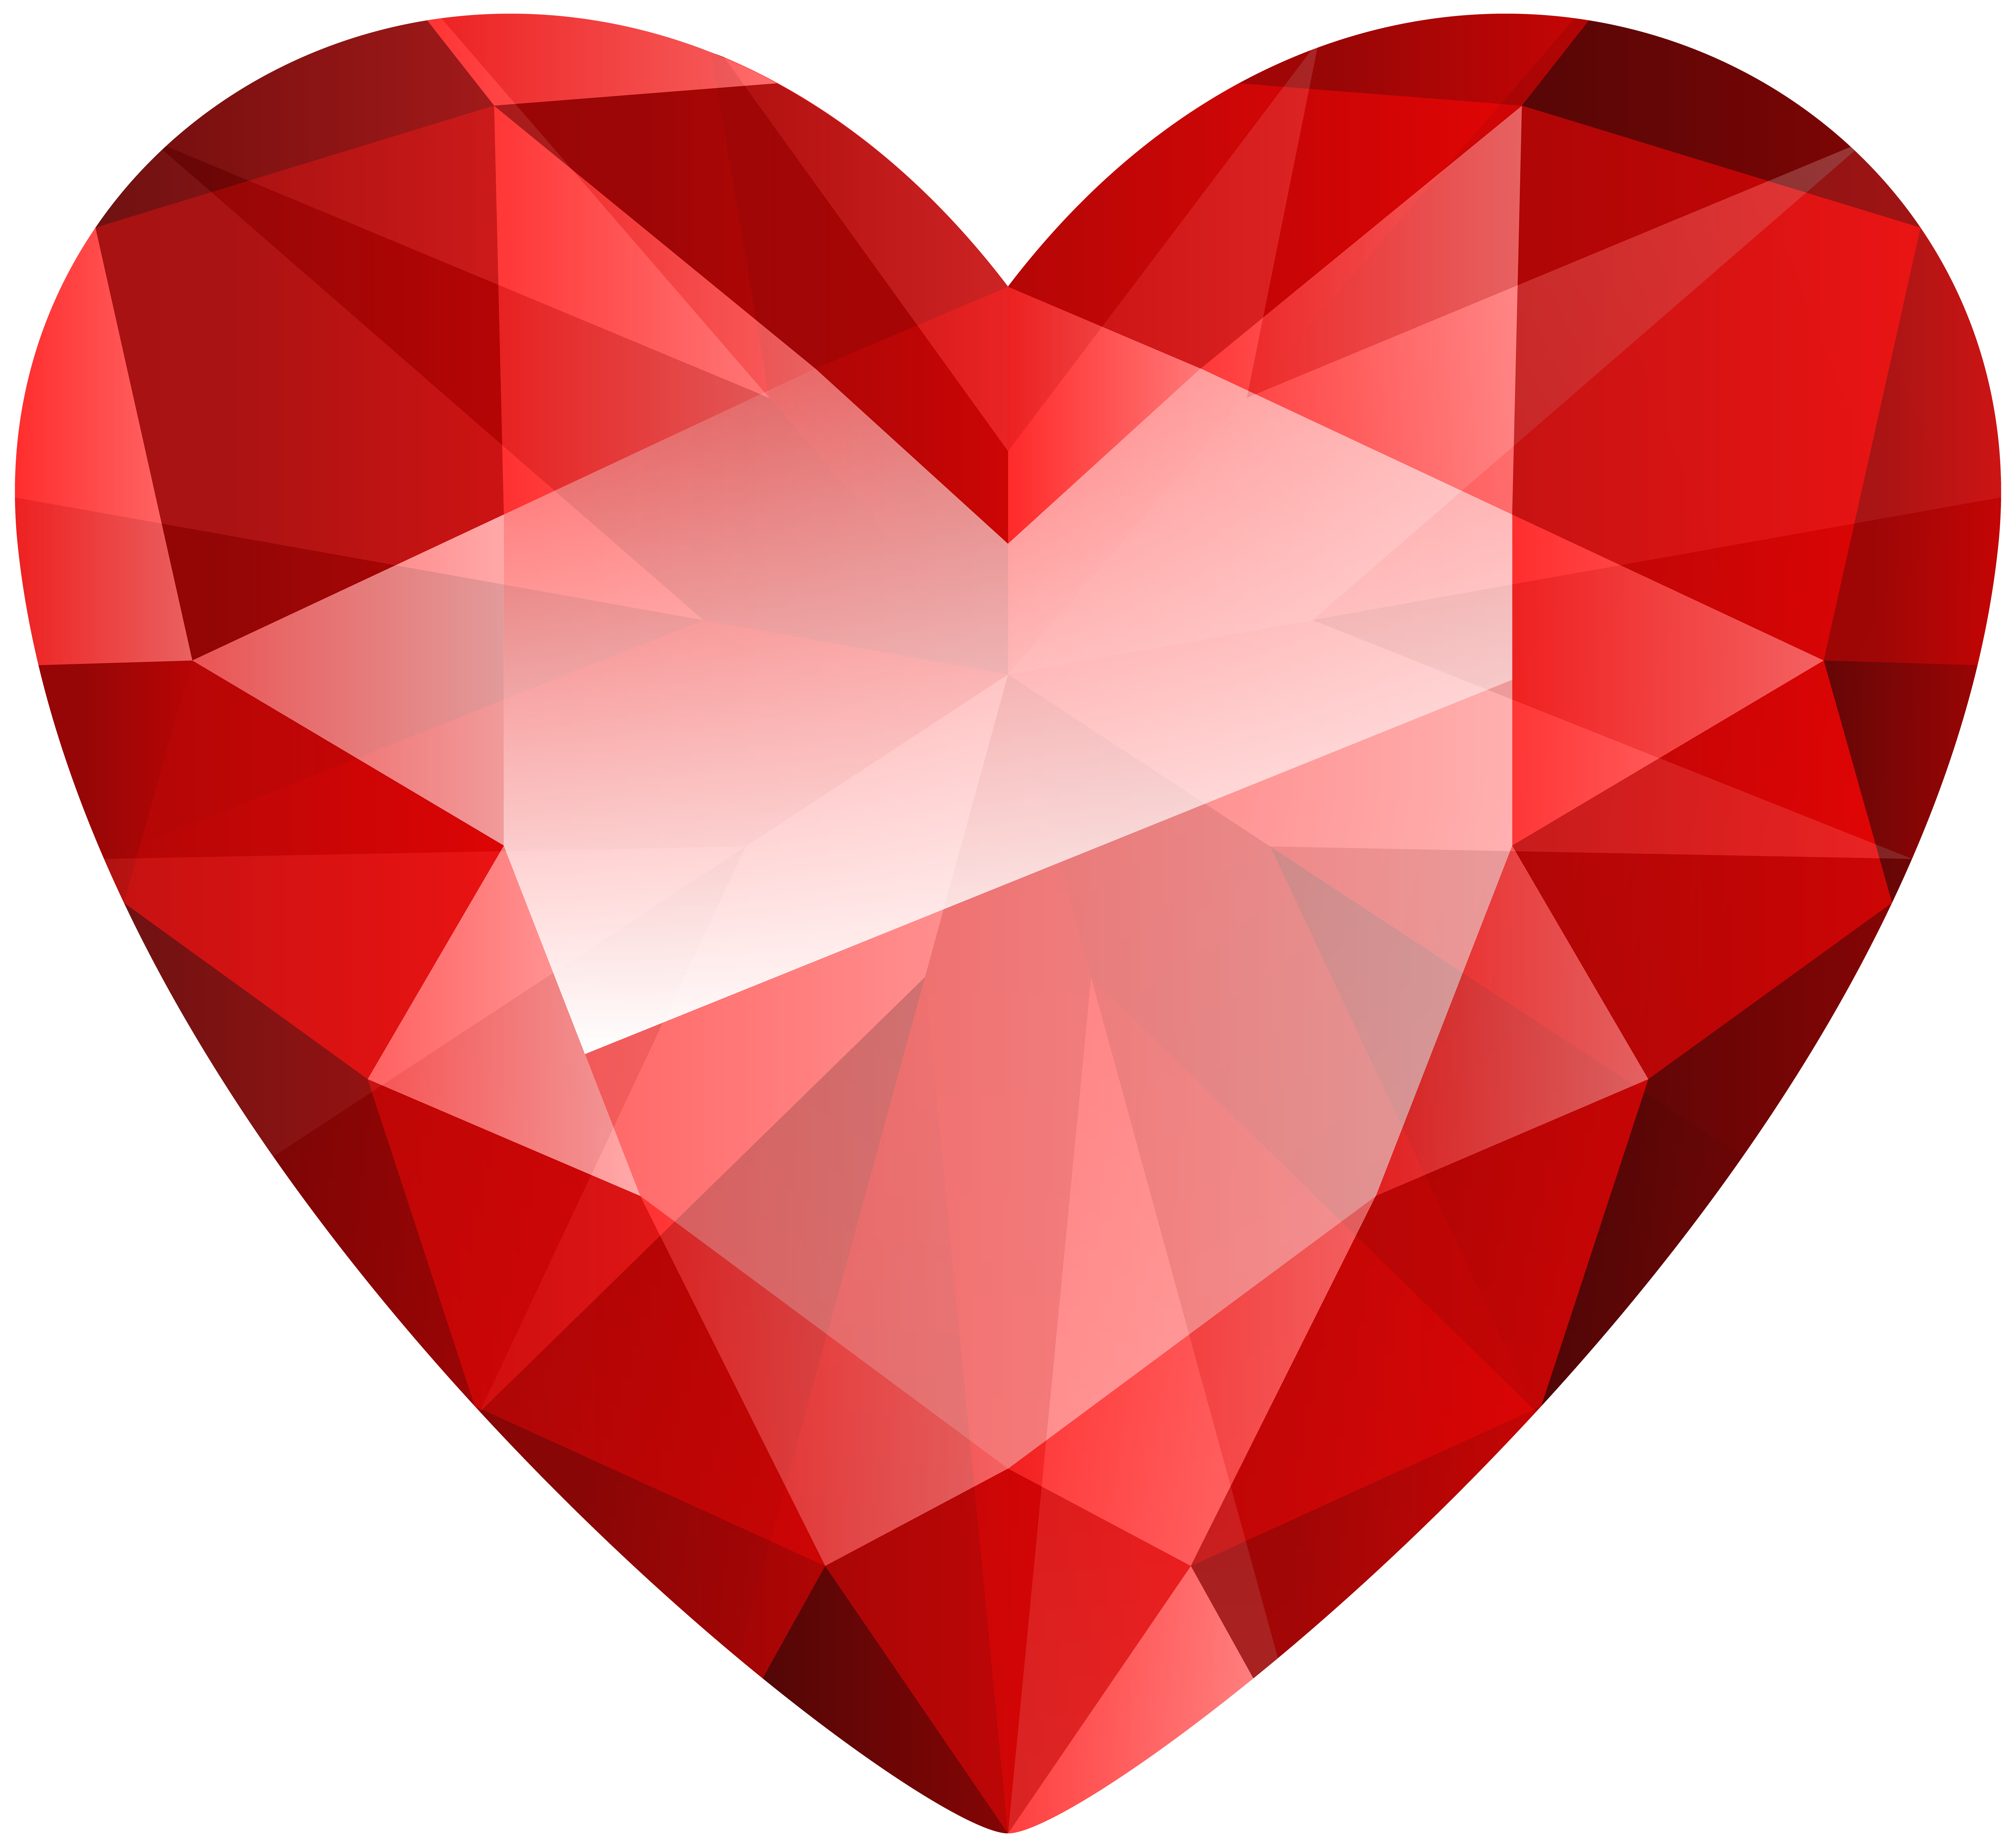 Diamond Heart Transparent Clip Art Image.